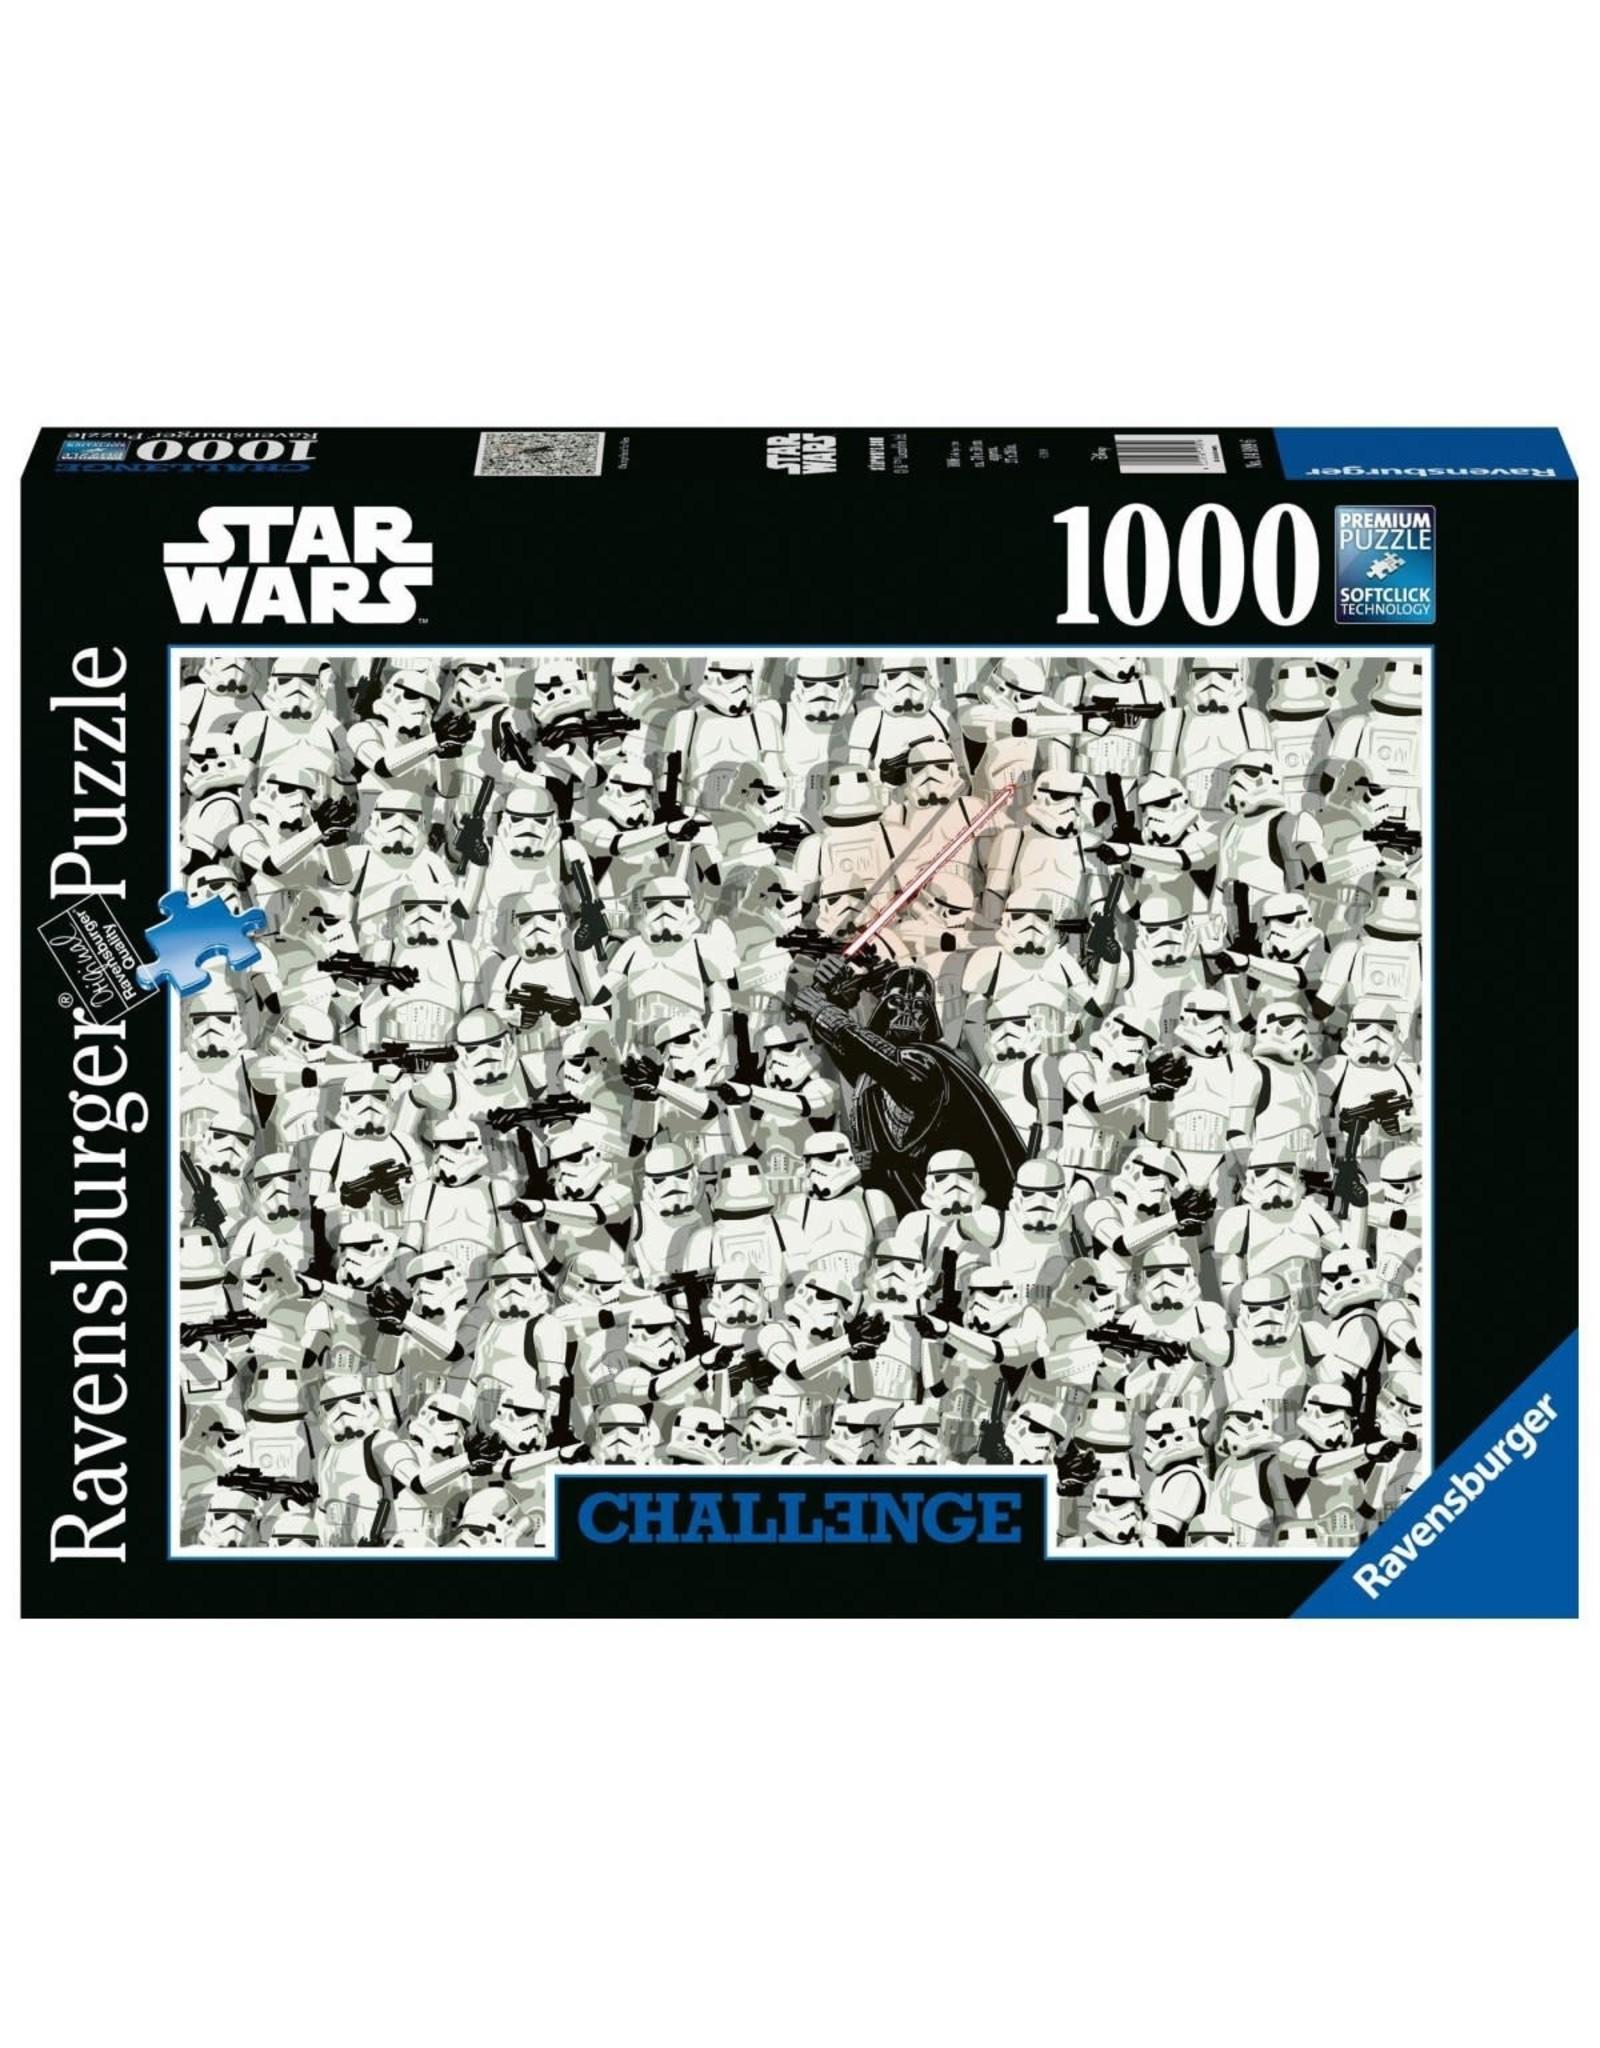 Ravensburger STAR WARS Challenge Puzzle 1000P - Stormtroopers